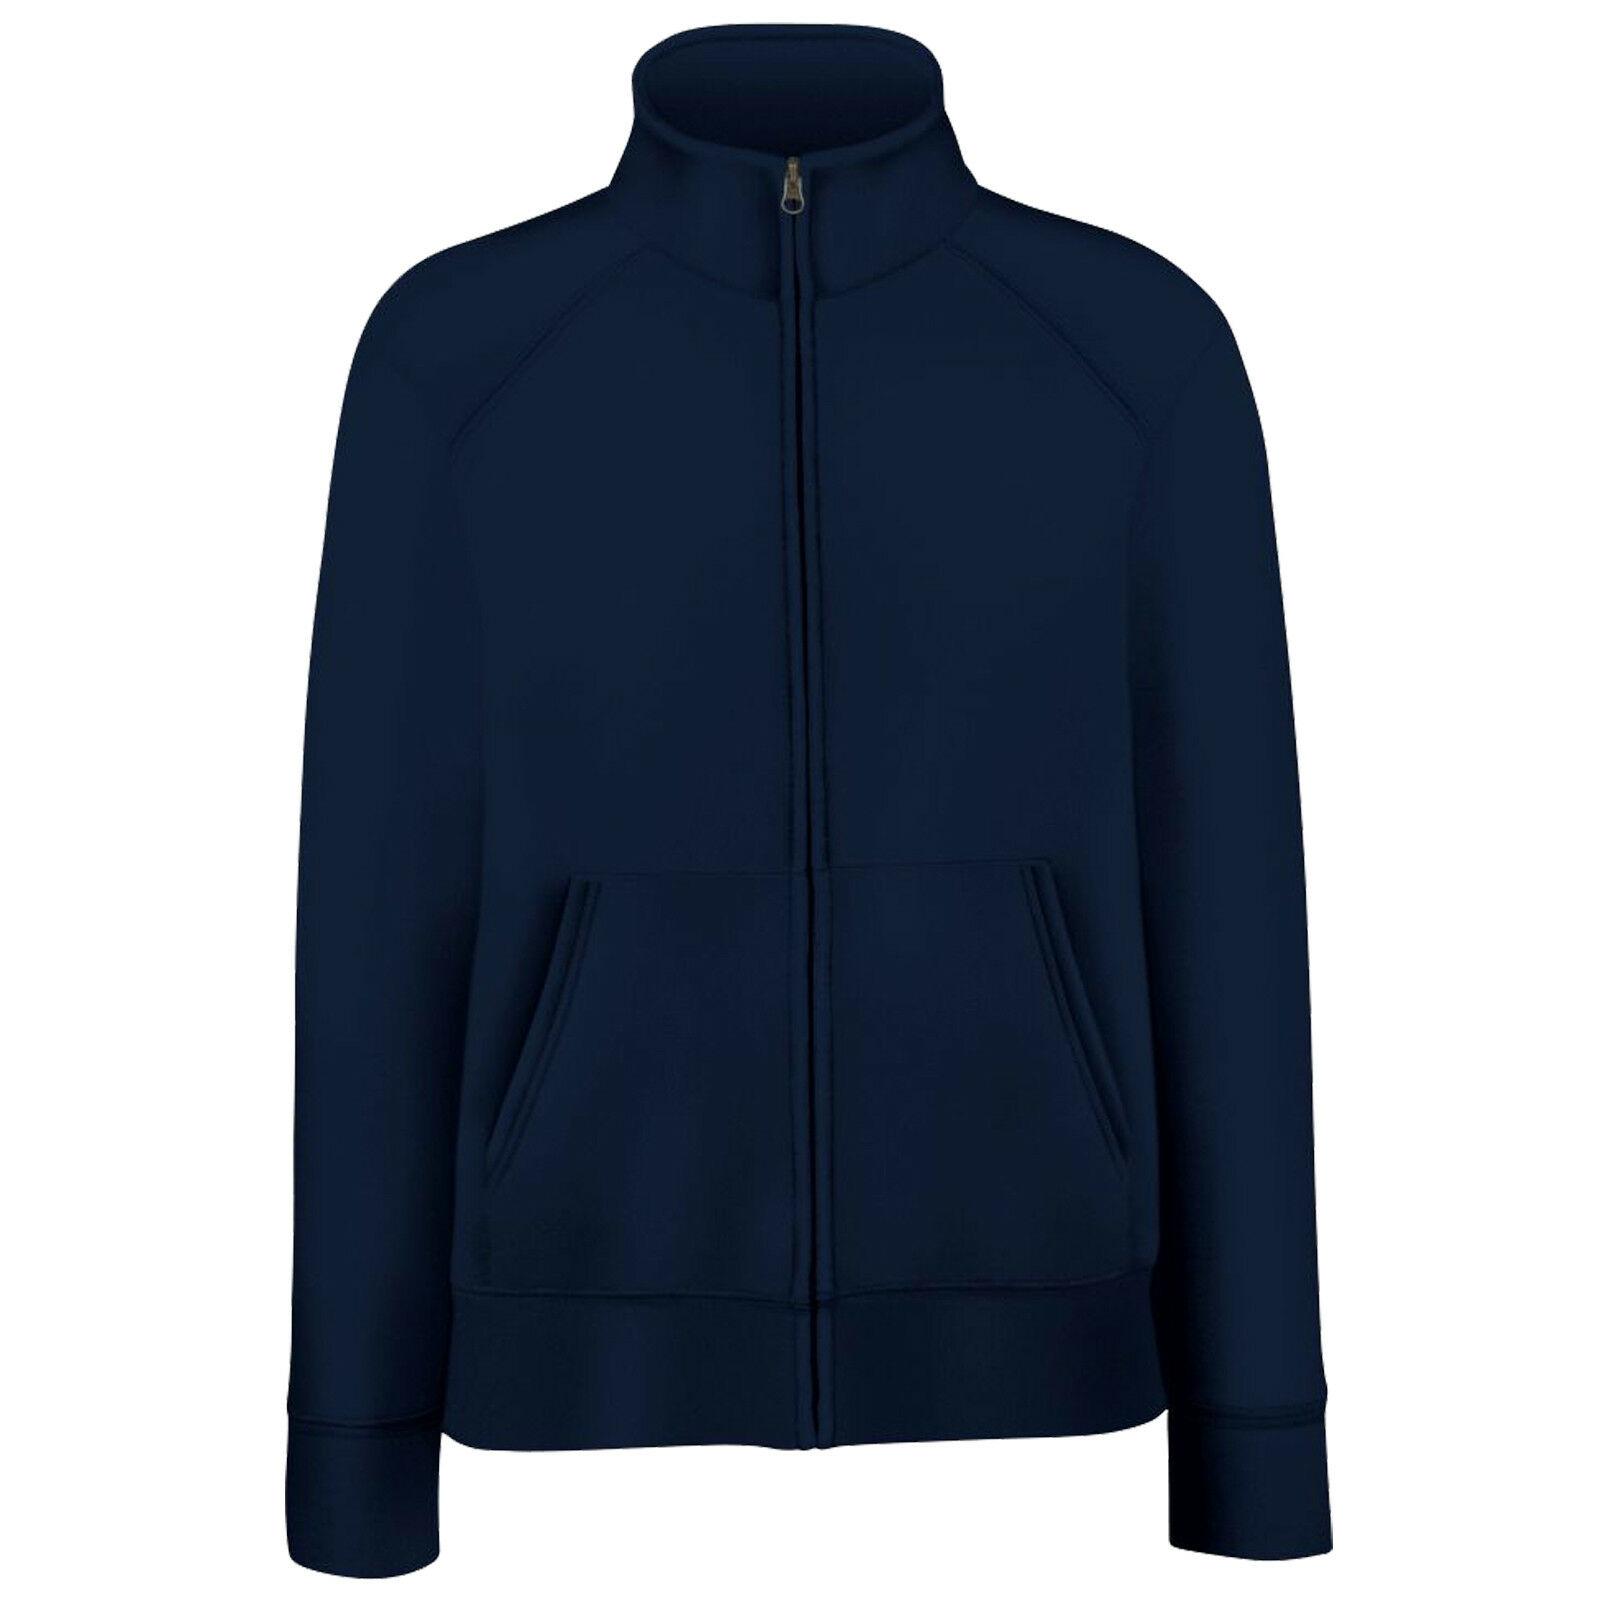 Fruit Of The Loom Ladies/Womens Lady-Fit Fleece Sweatshirt Jacket (XS) (Deep Navy)